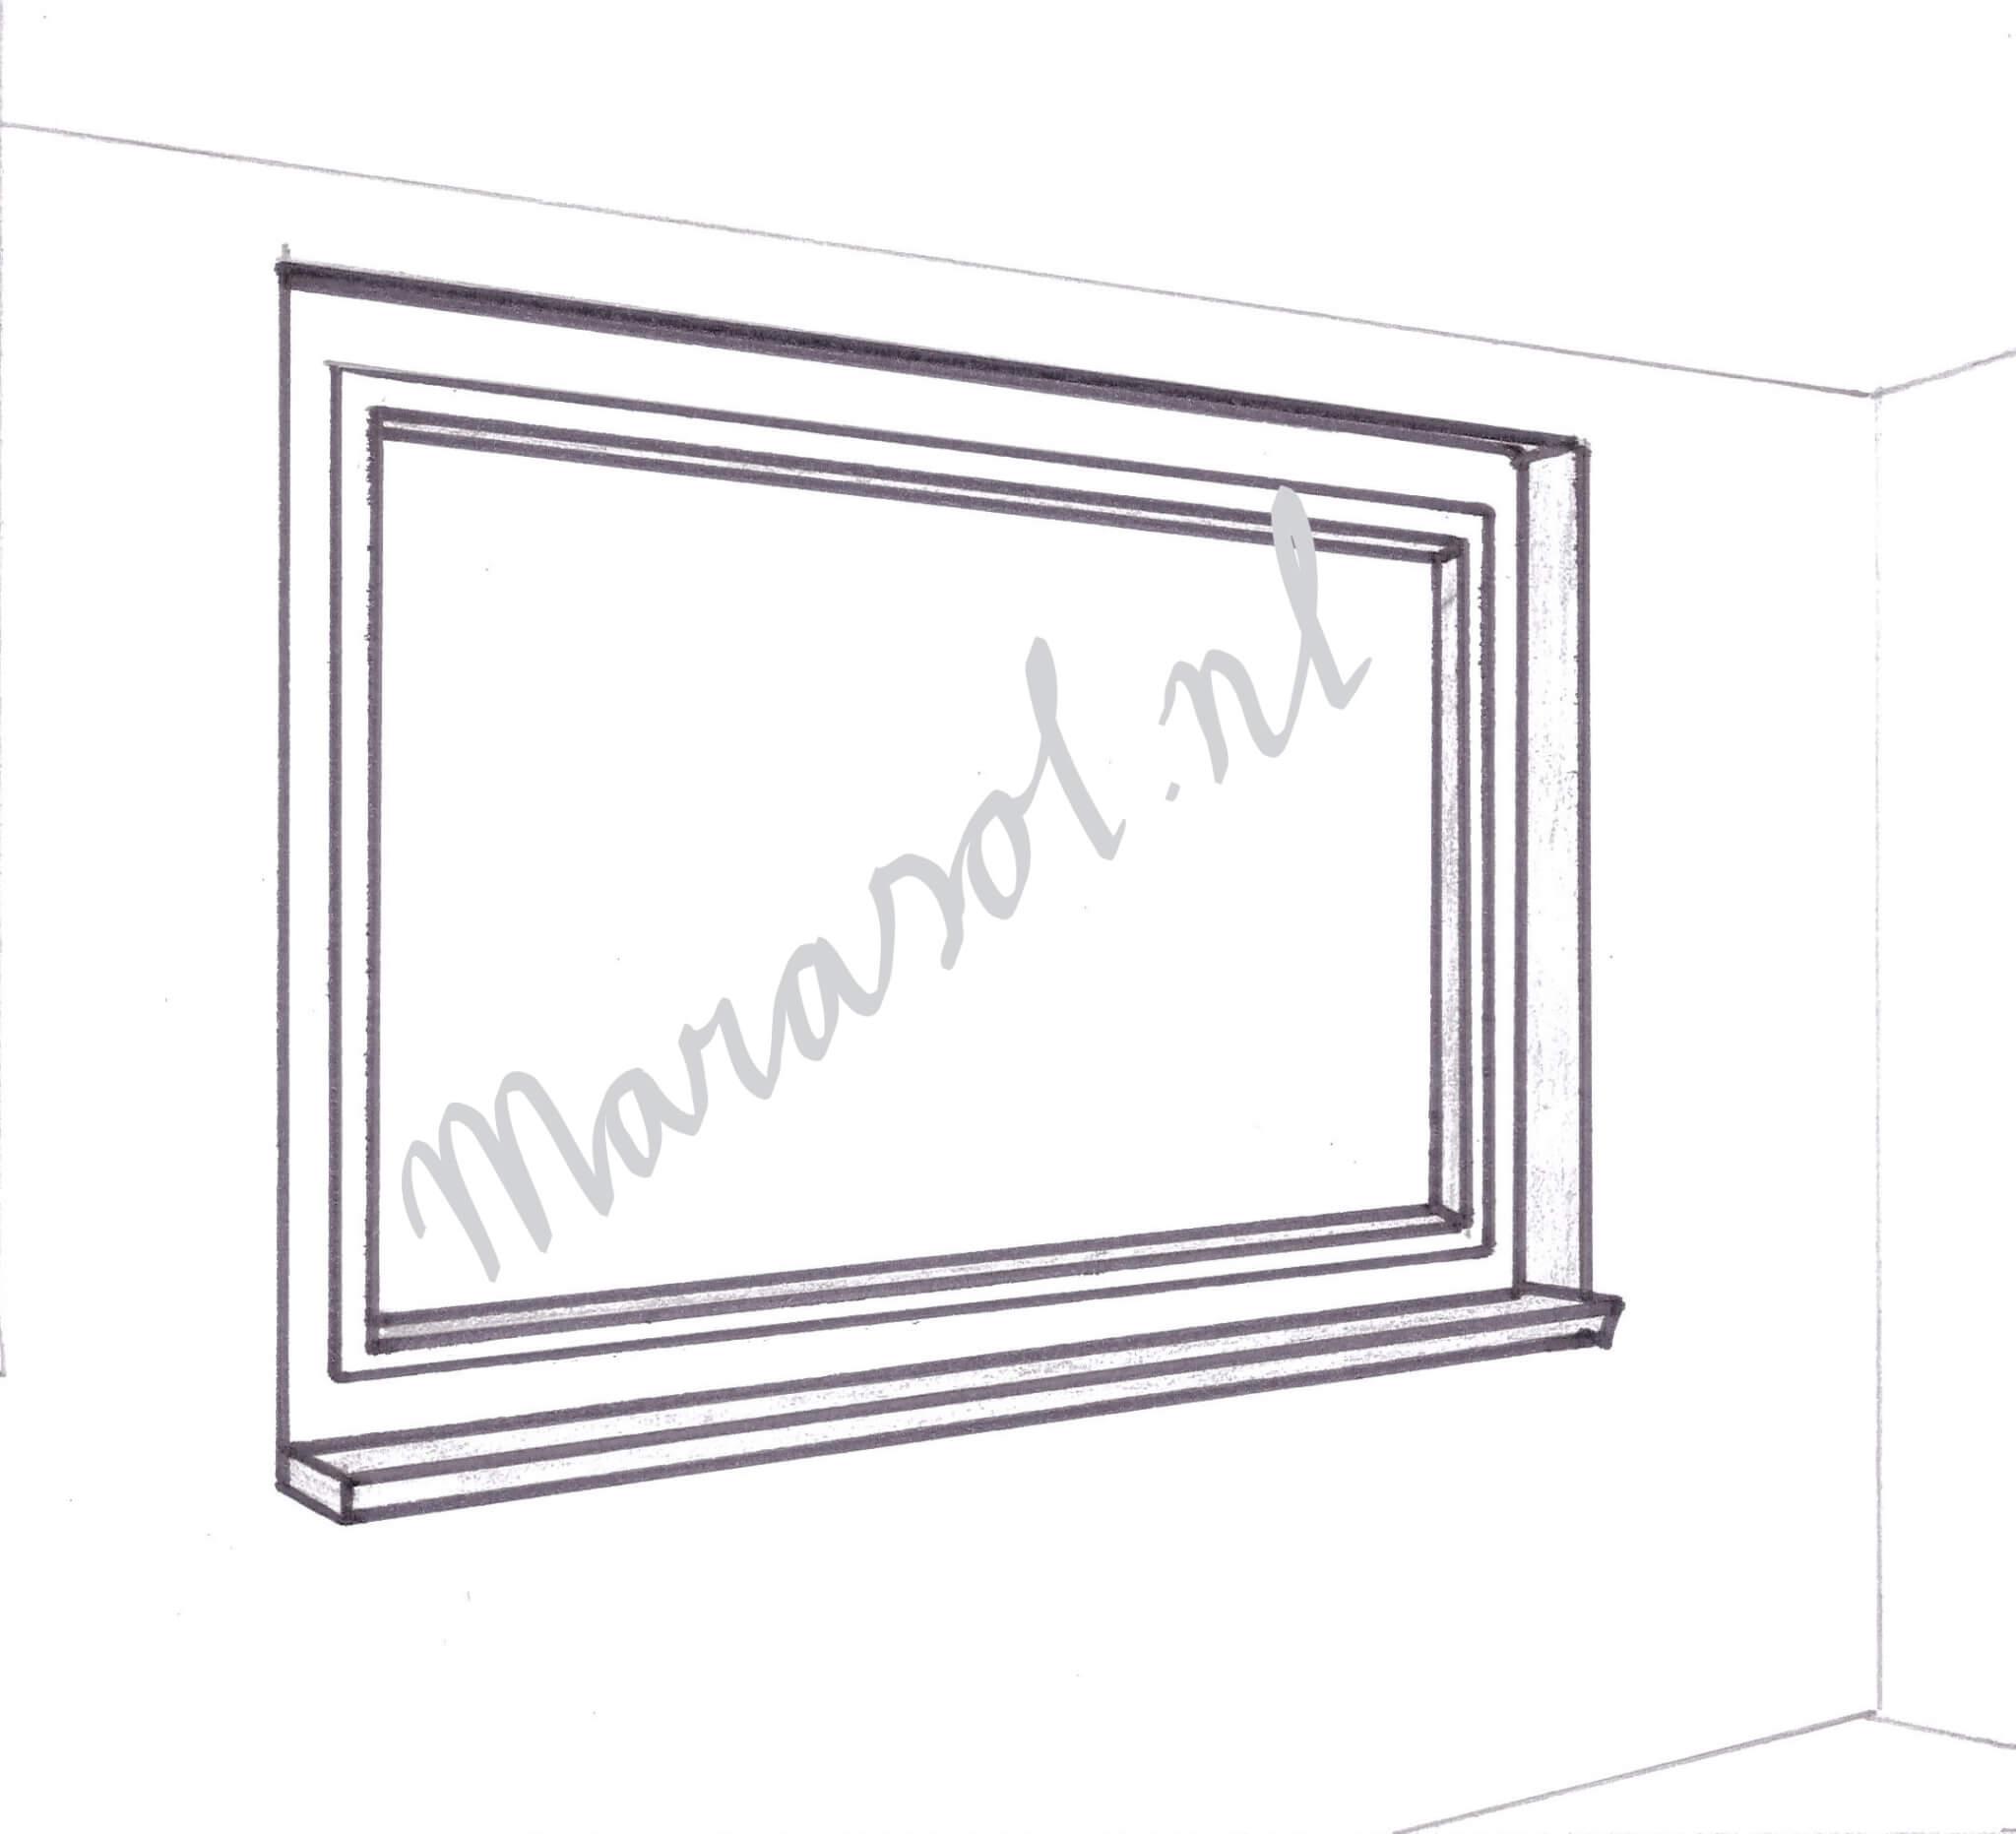 Breed raam tot maximaal 3 meter